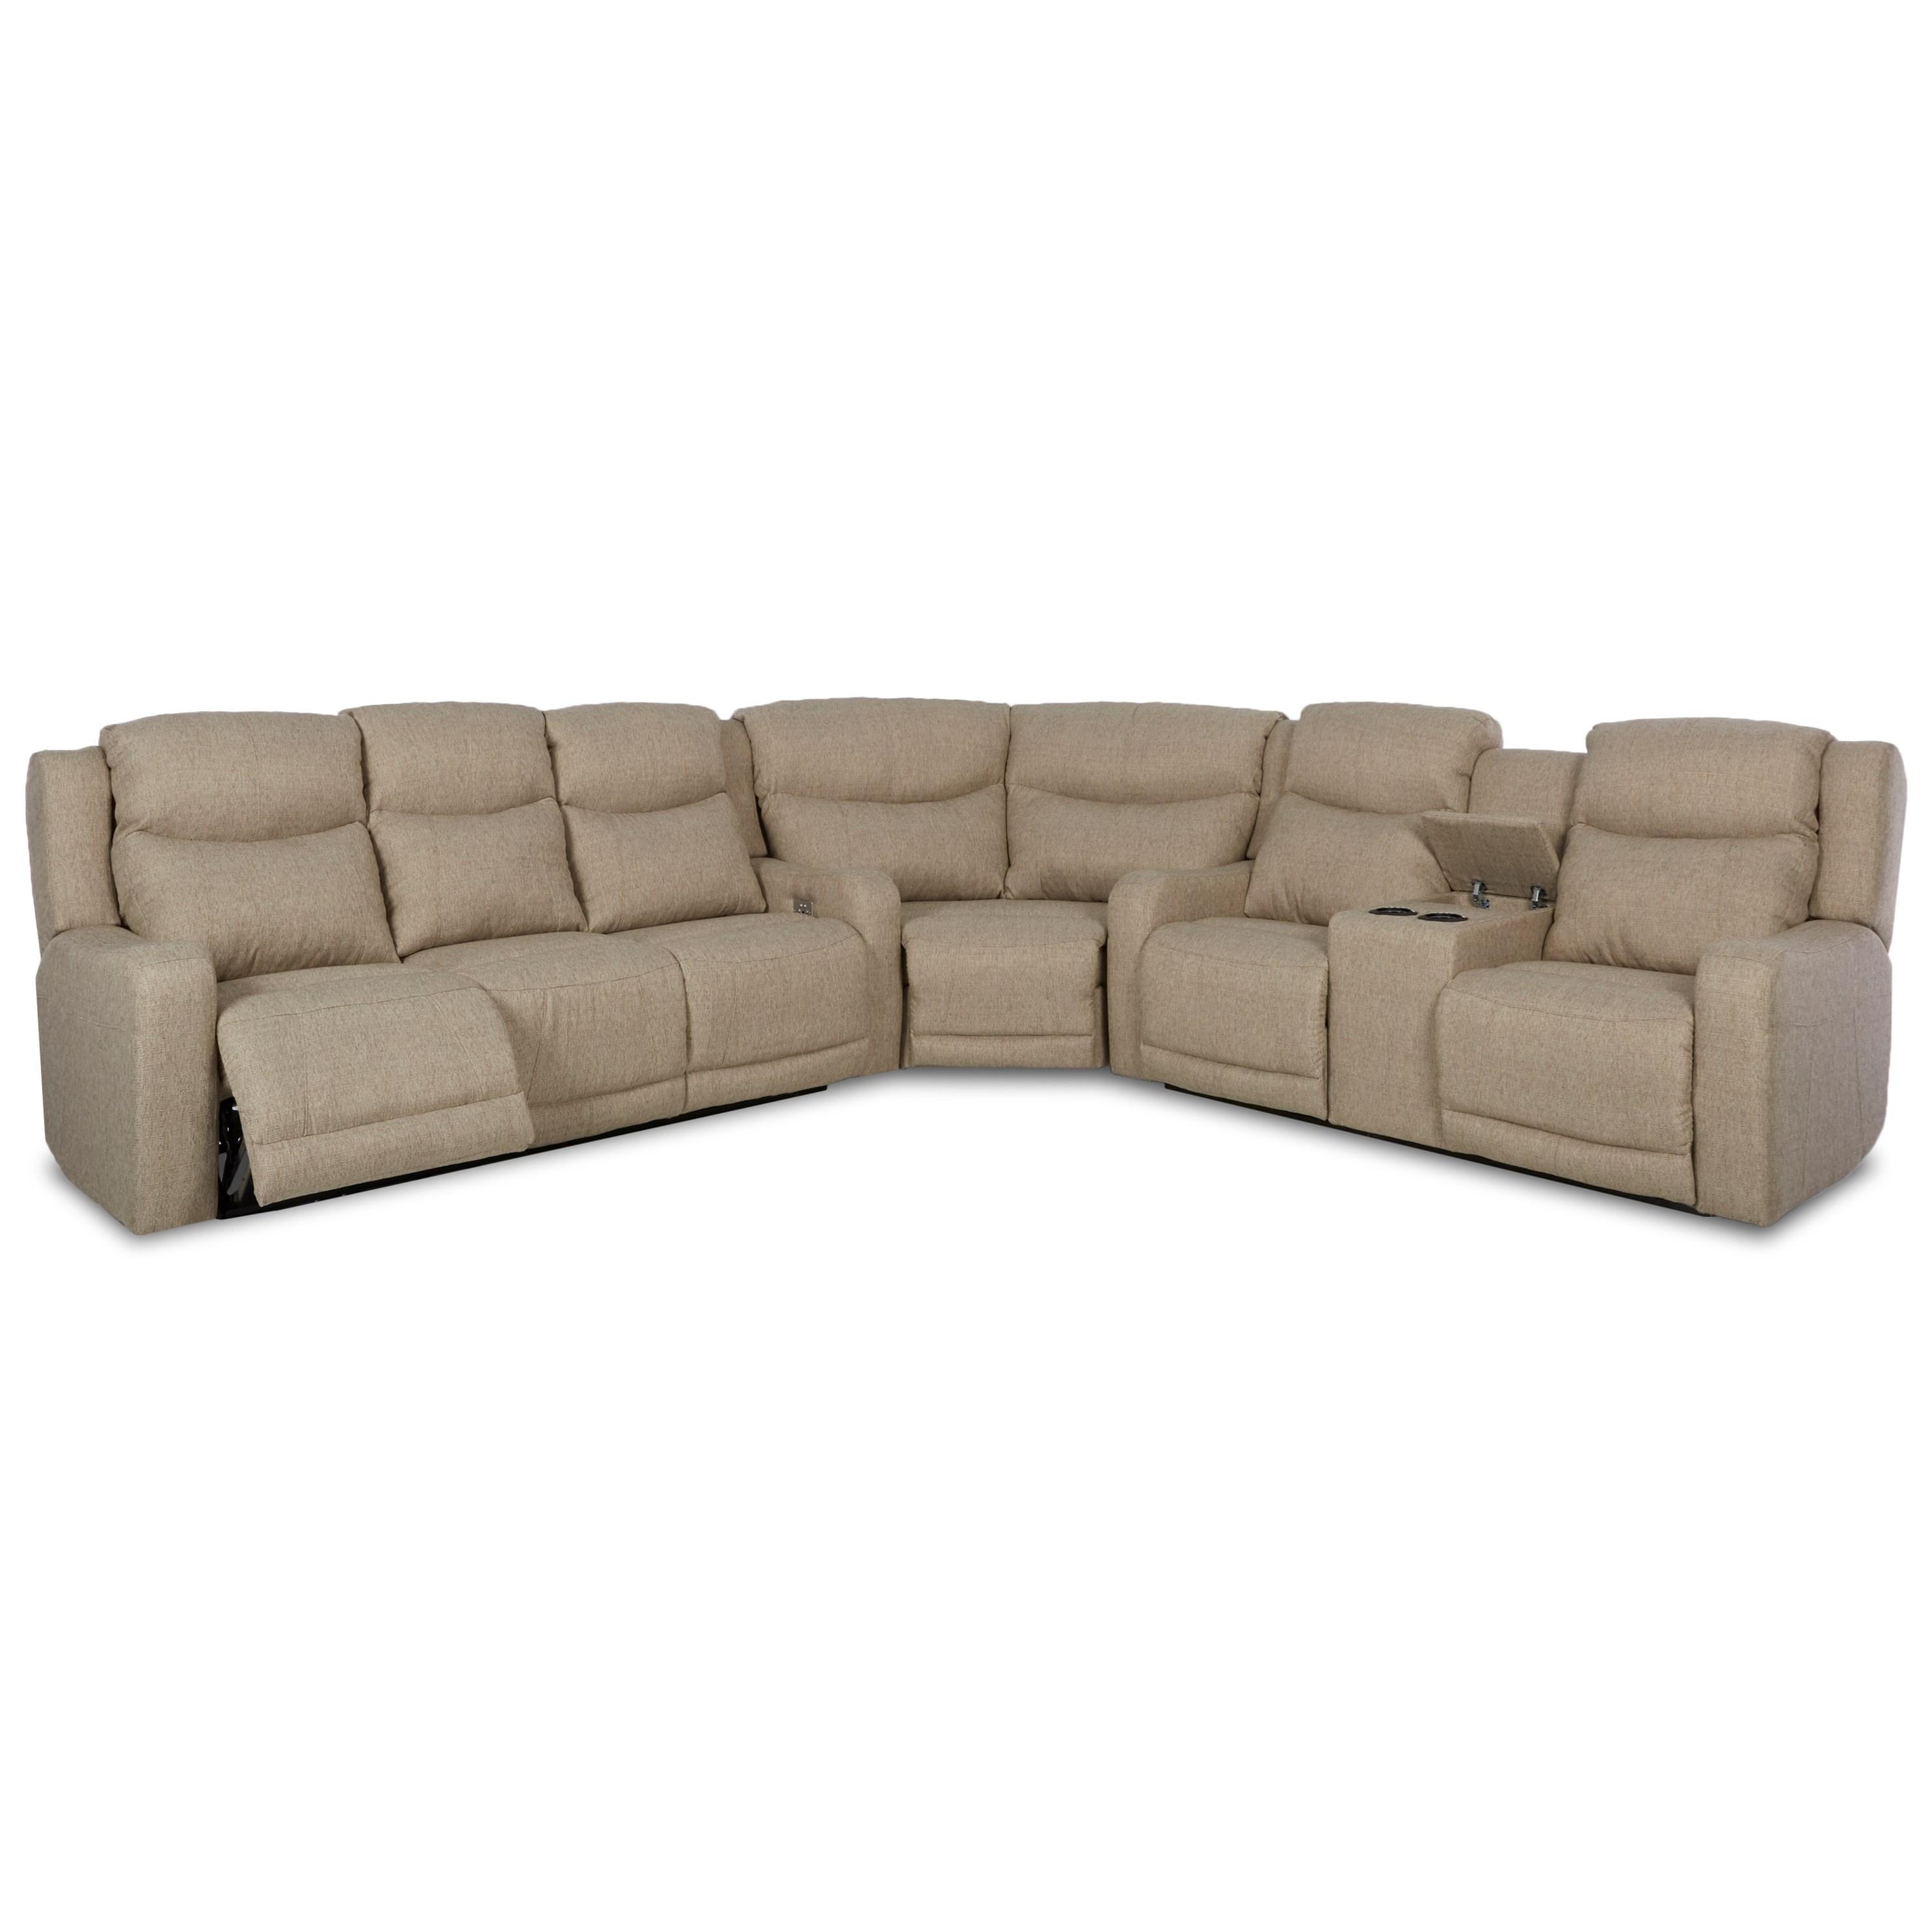 two cushion power reclining sofa living room ikea klaussner barnett with